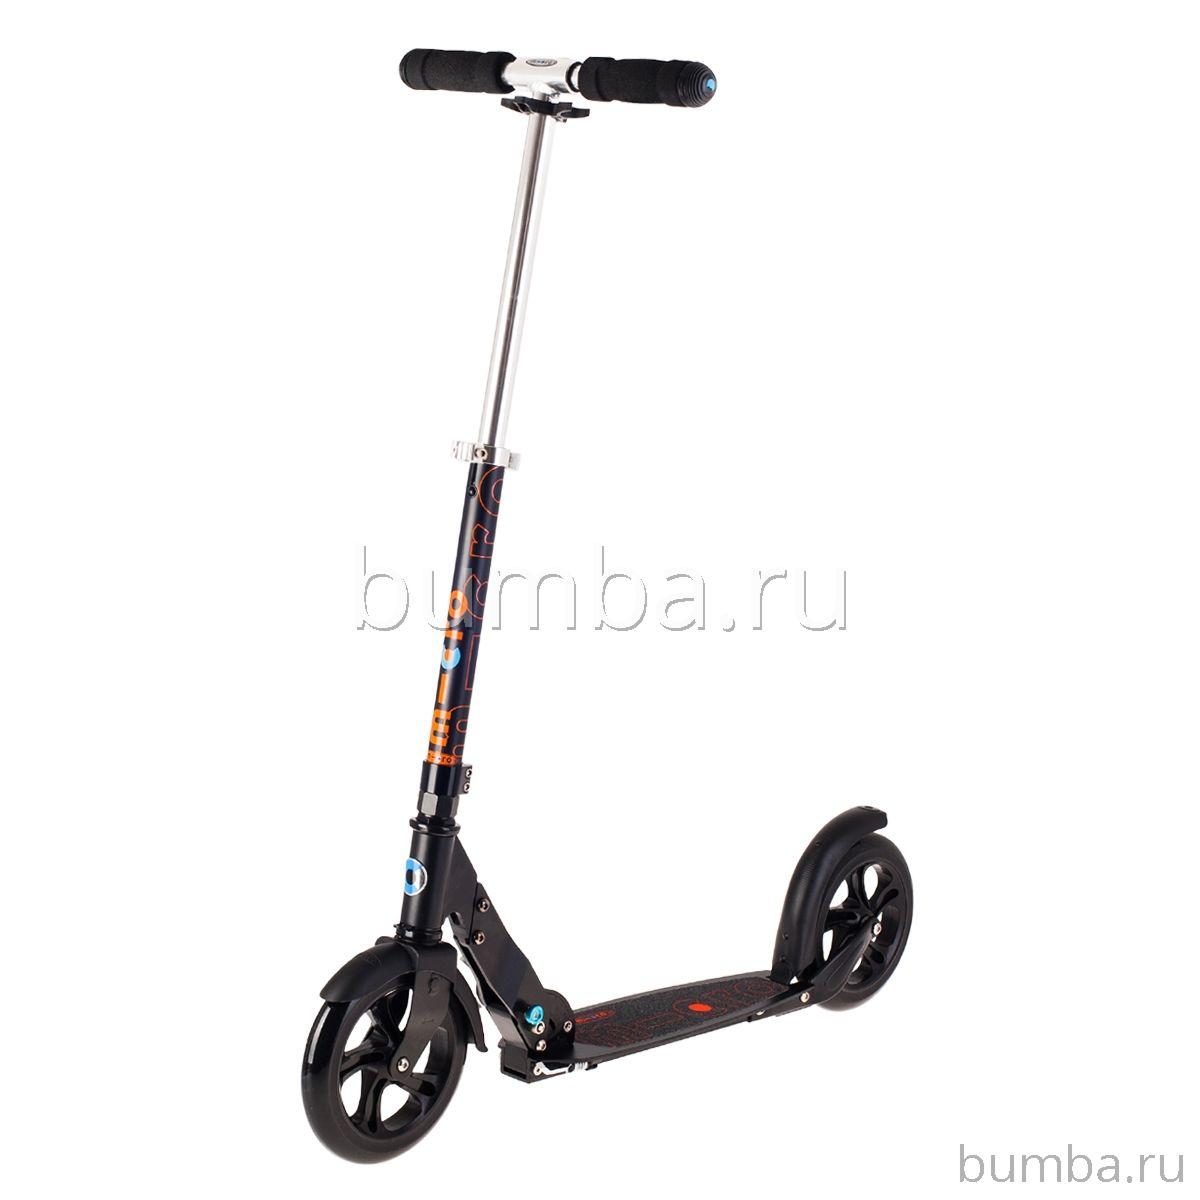 micro scooter black 13 900. Black Bedroom Furniture Sets. Home Design Ideas